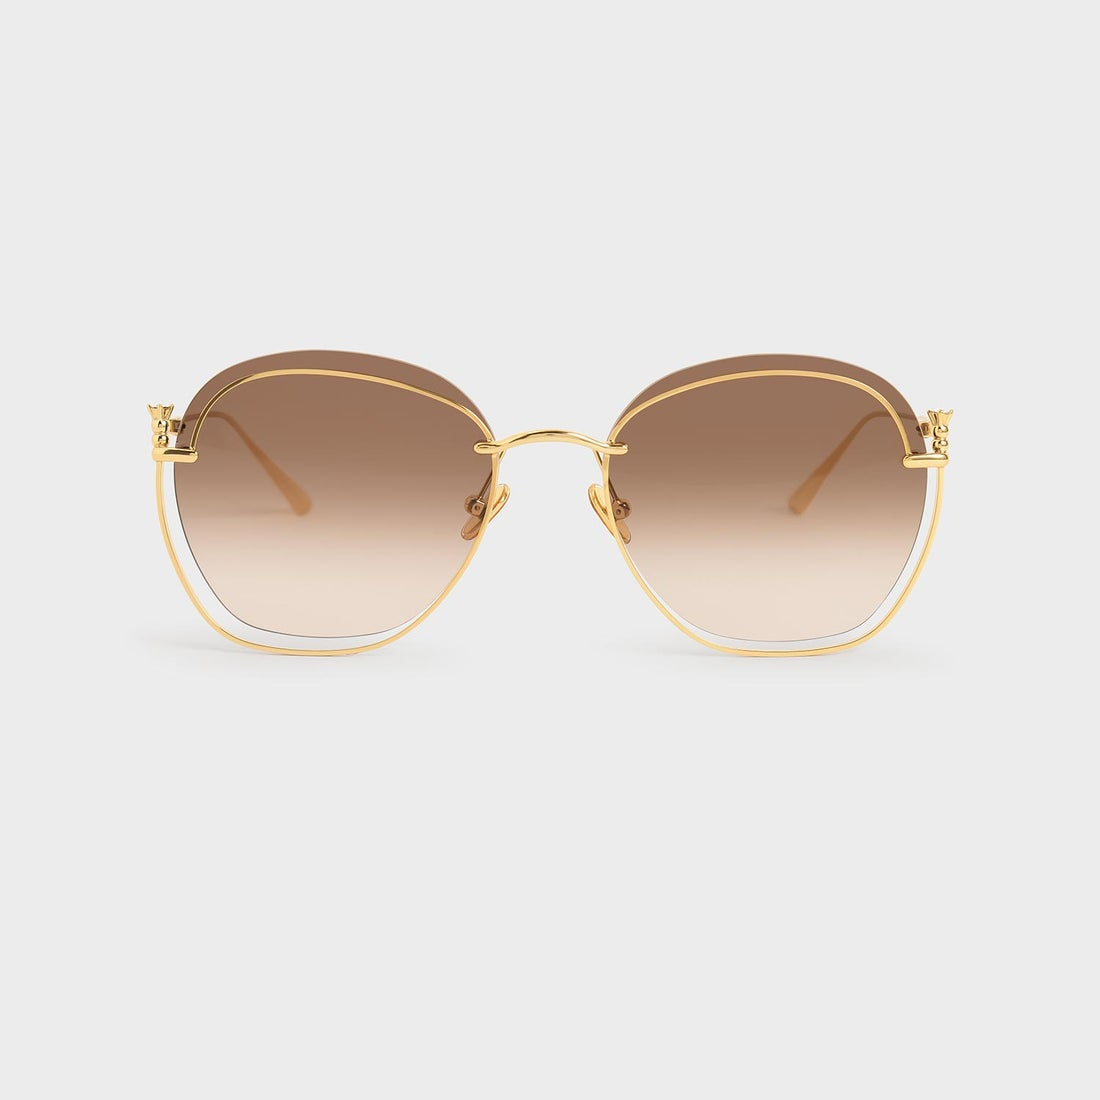 【2020 FALL 新作】カットアウトラウンドサングラス / Cut-Out Round Sunglasses (Gold)